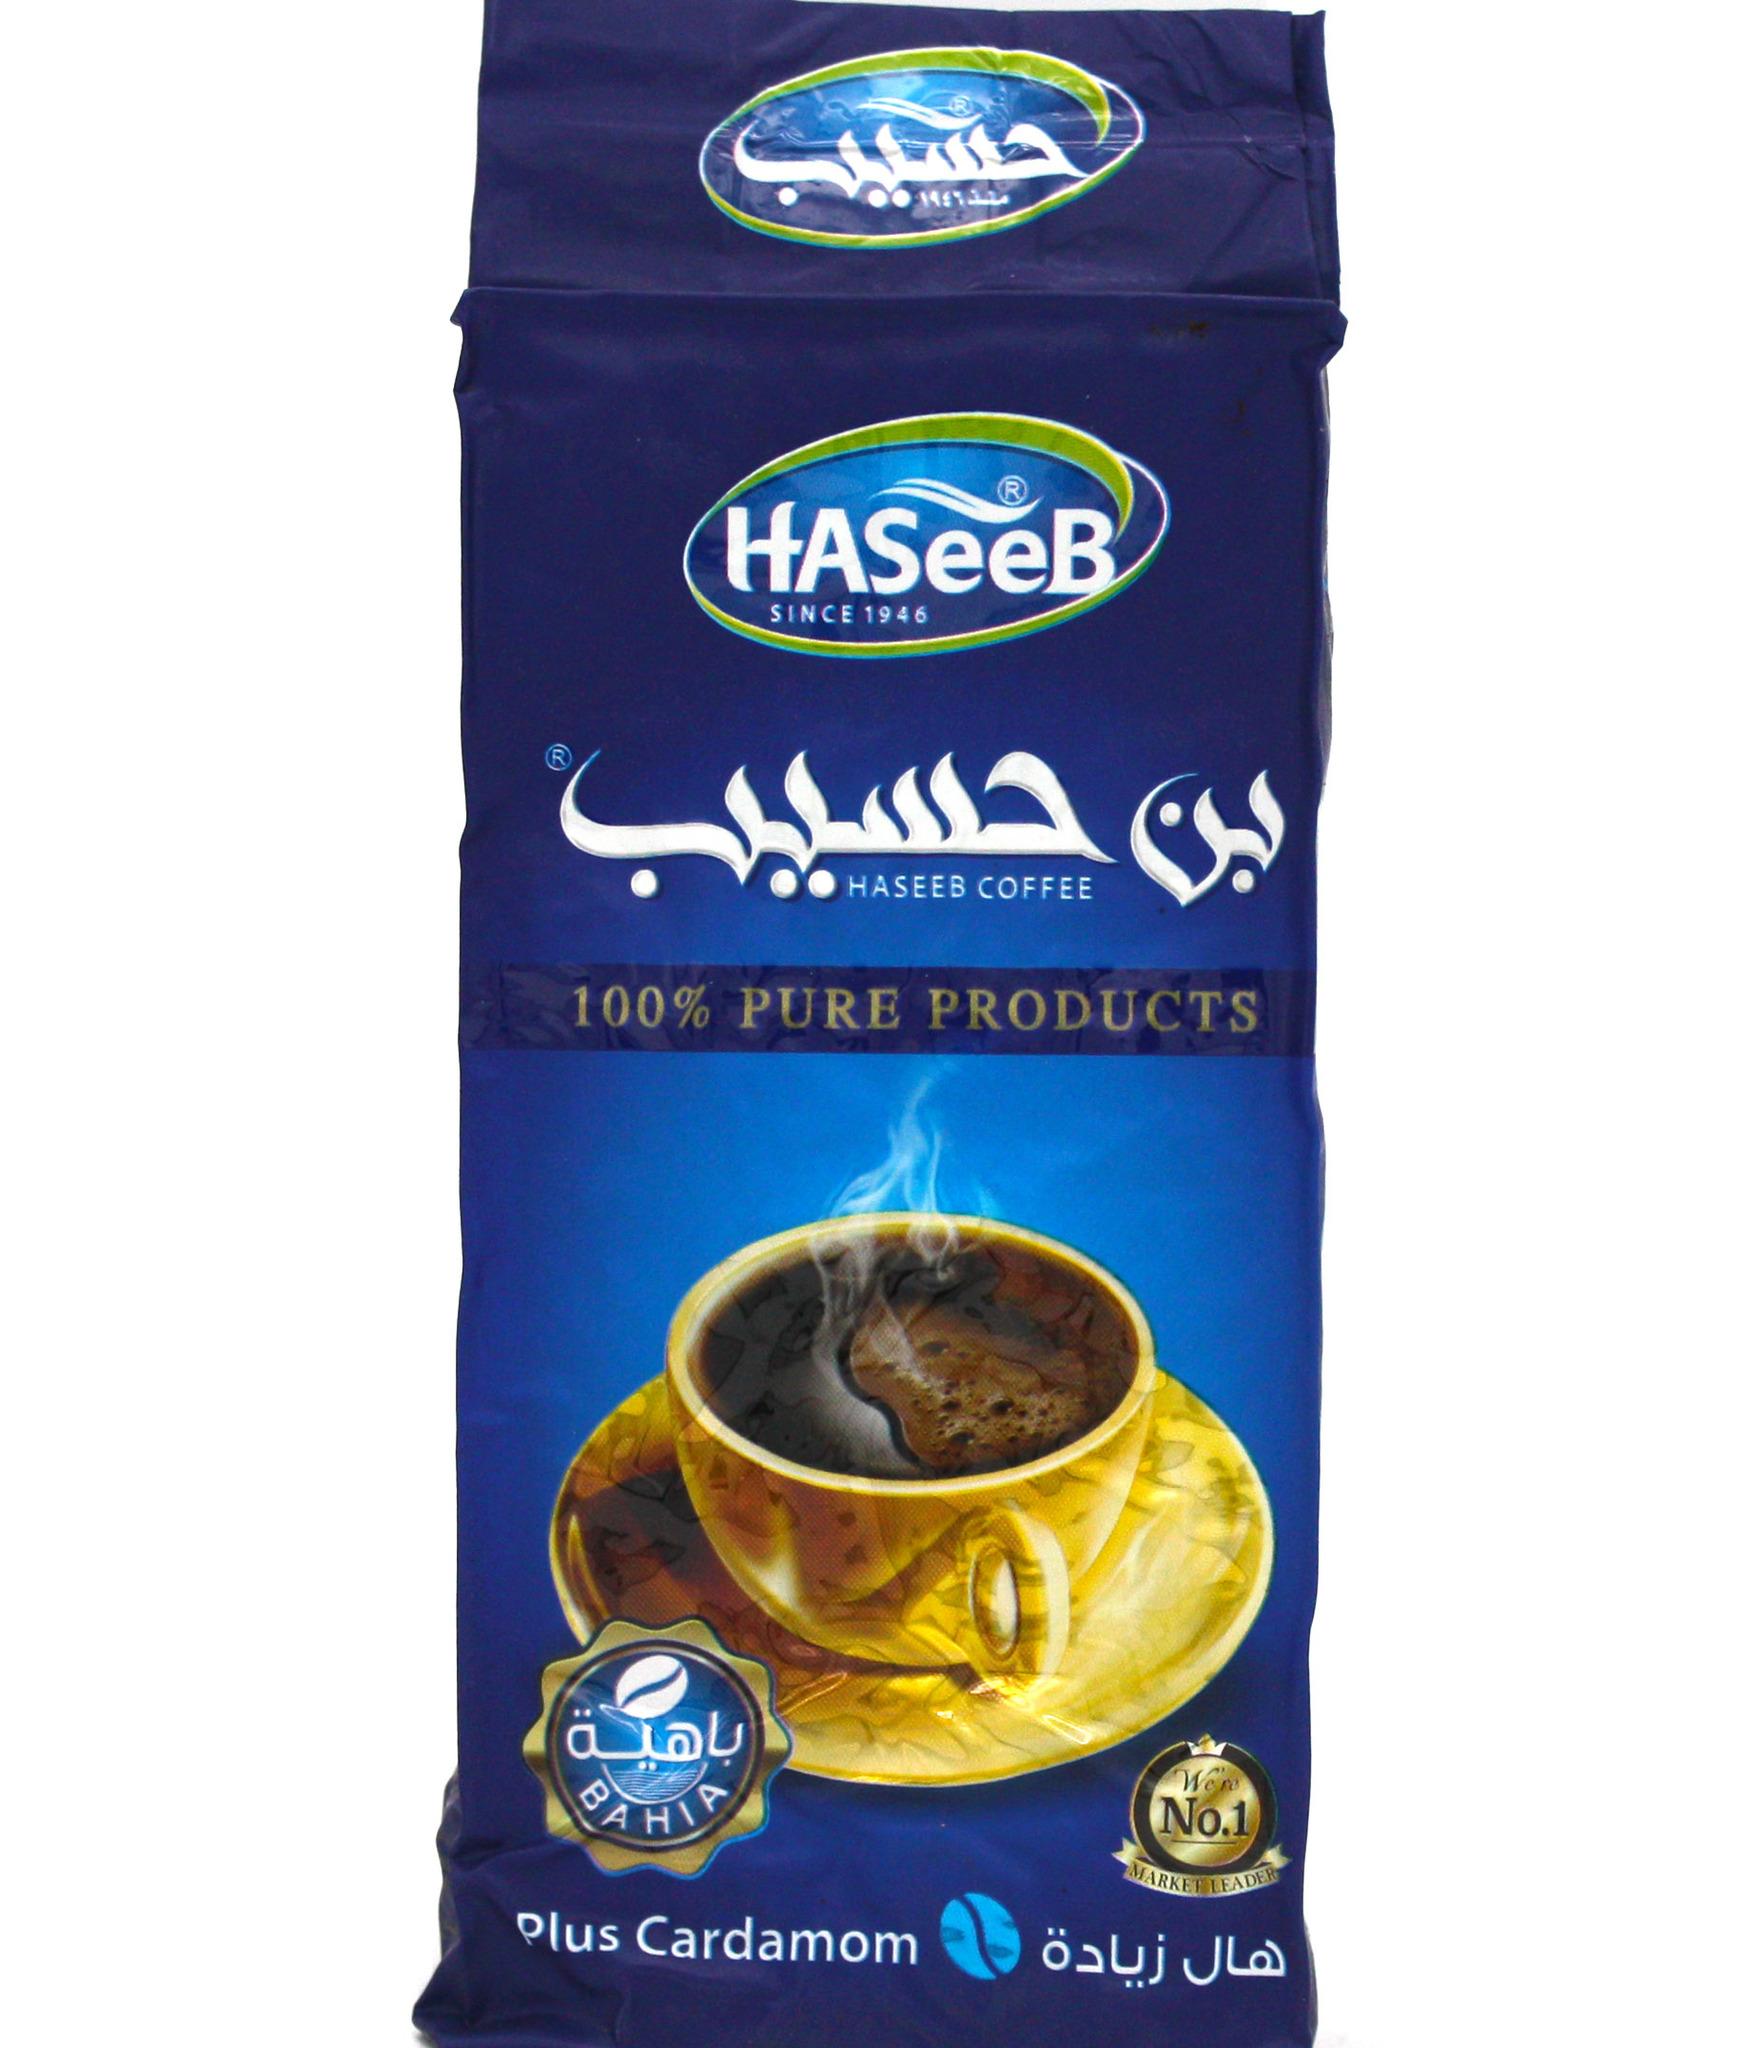 Кофе молотый Арабский кофе Plus Cardamom, Haseeb, 200 г import_files_eb_eb555d1c1a2711e9a9a6484d7ecee297_1ef3f6981b1a11e9a9a6484d7ecee297.jpg